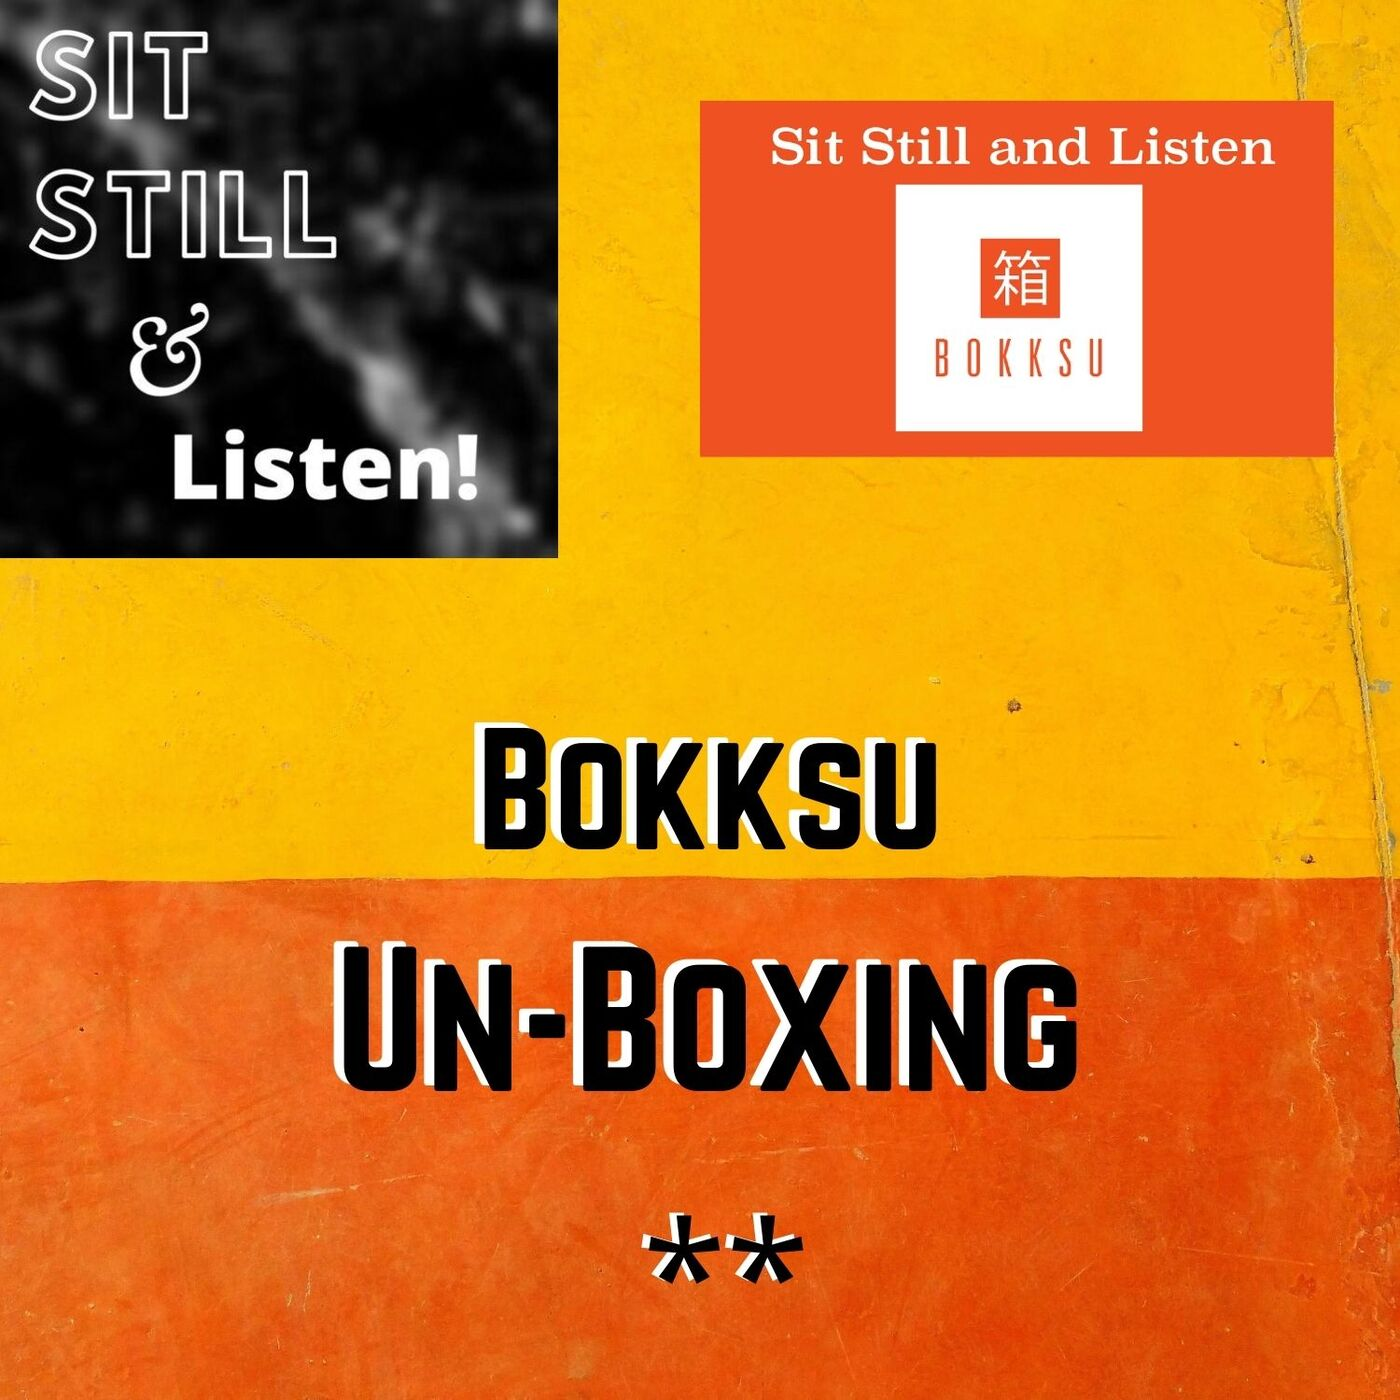 Bokksu UnBoxing